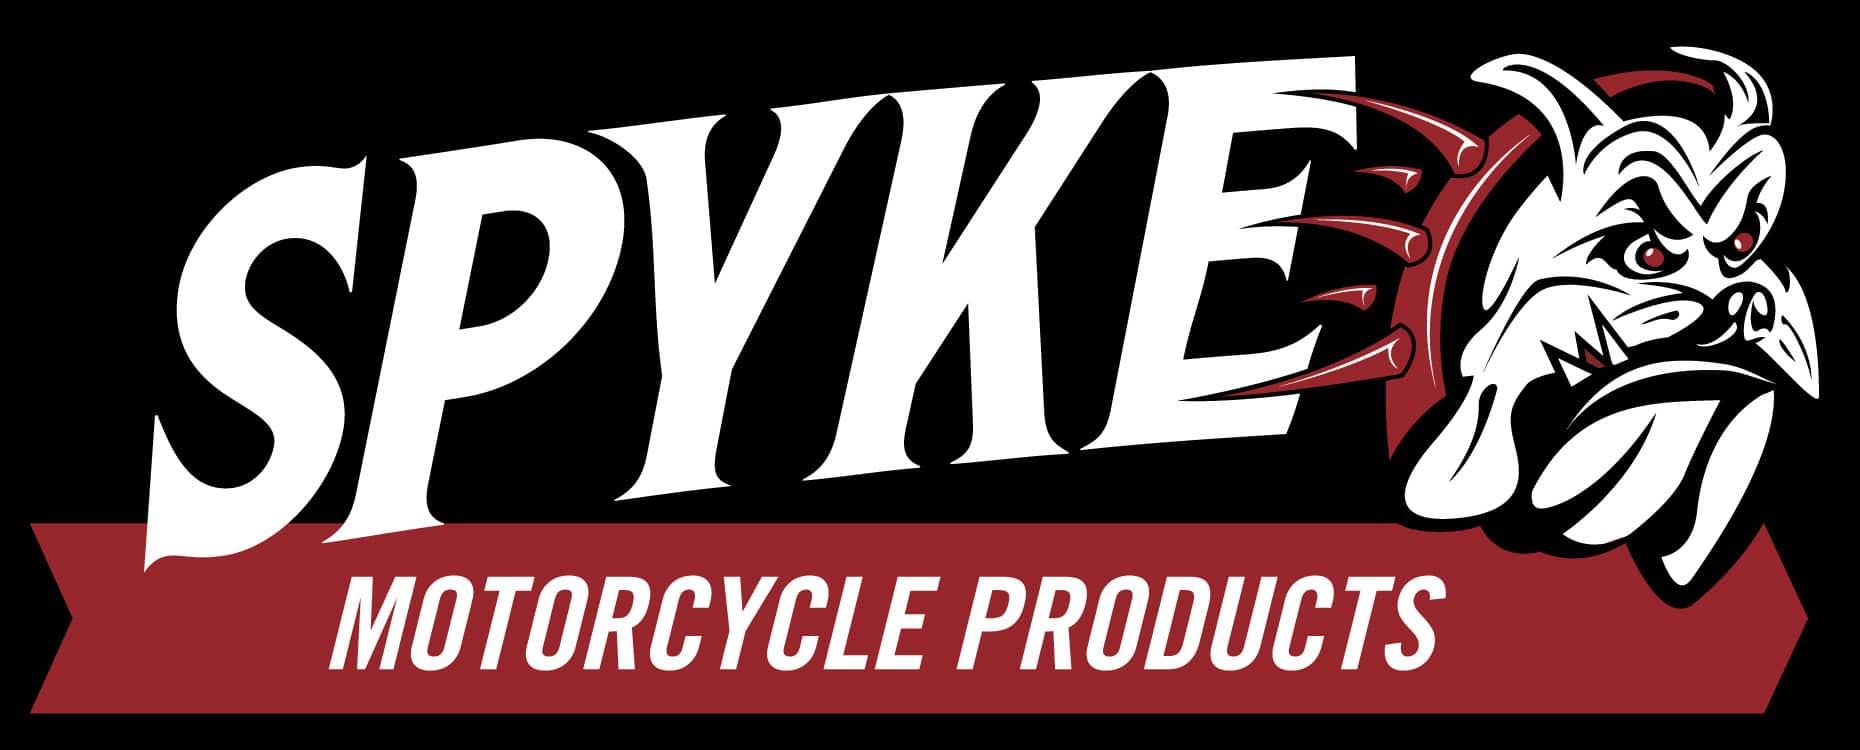 Spyke Motorcycle Products Rev Logo